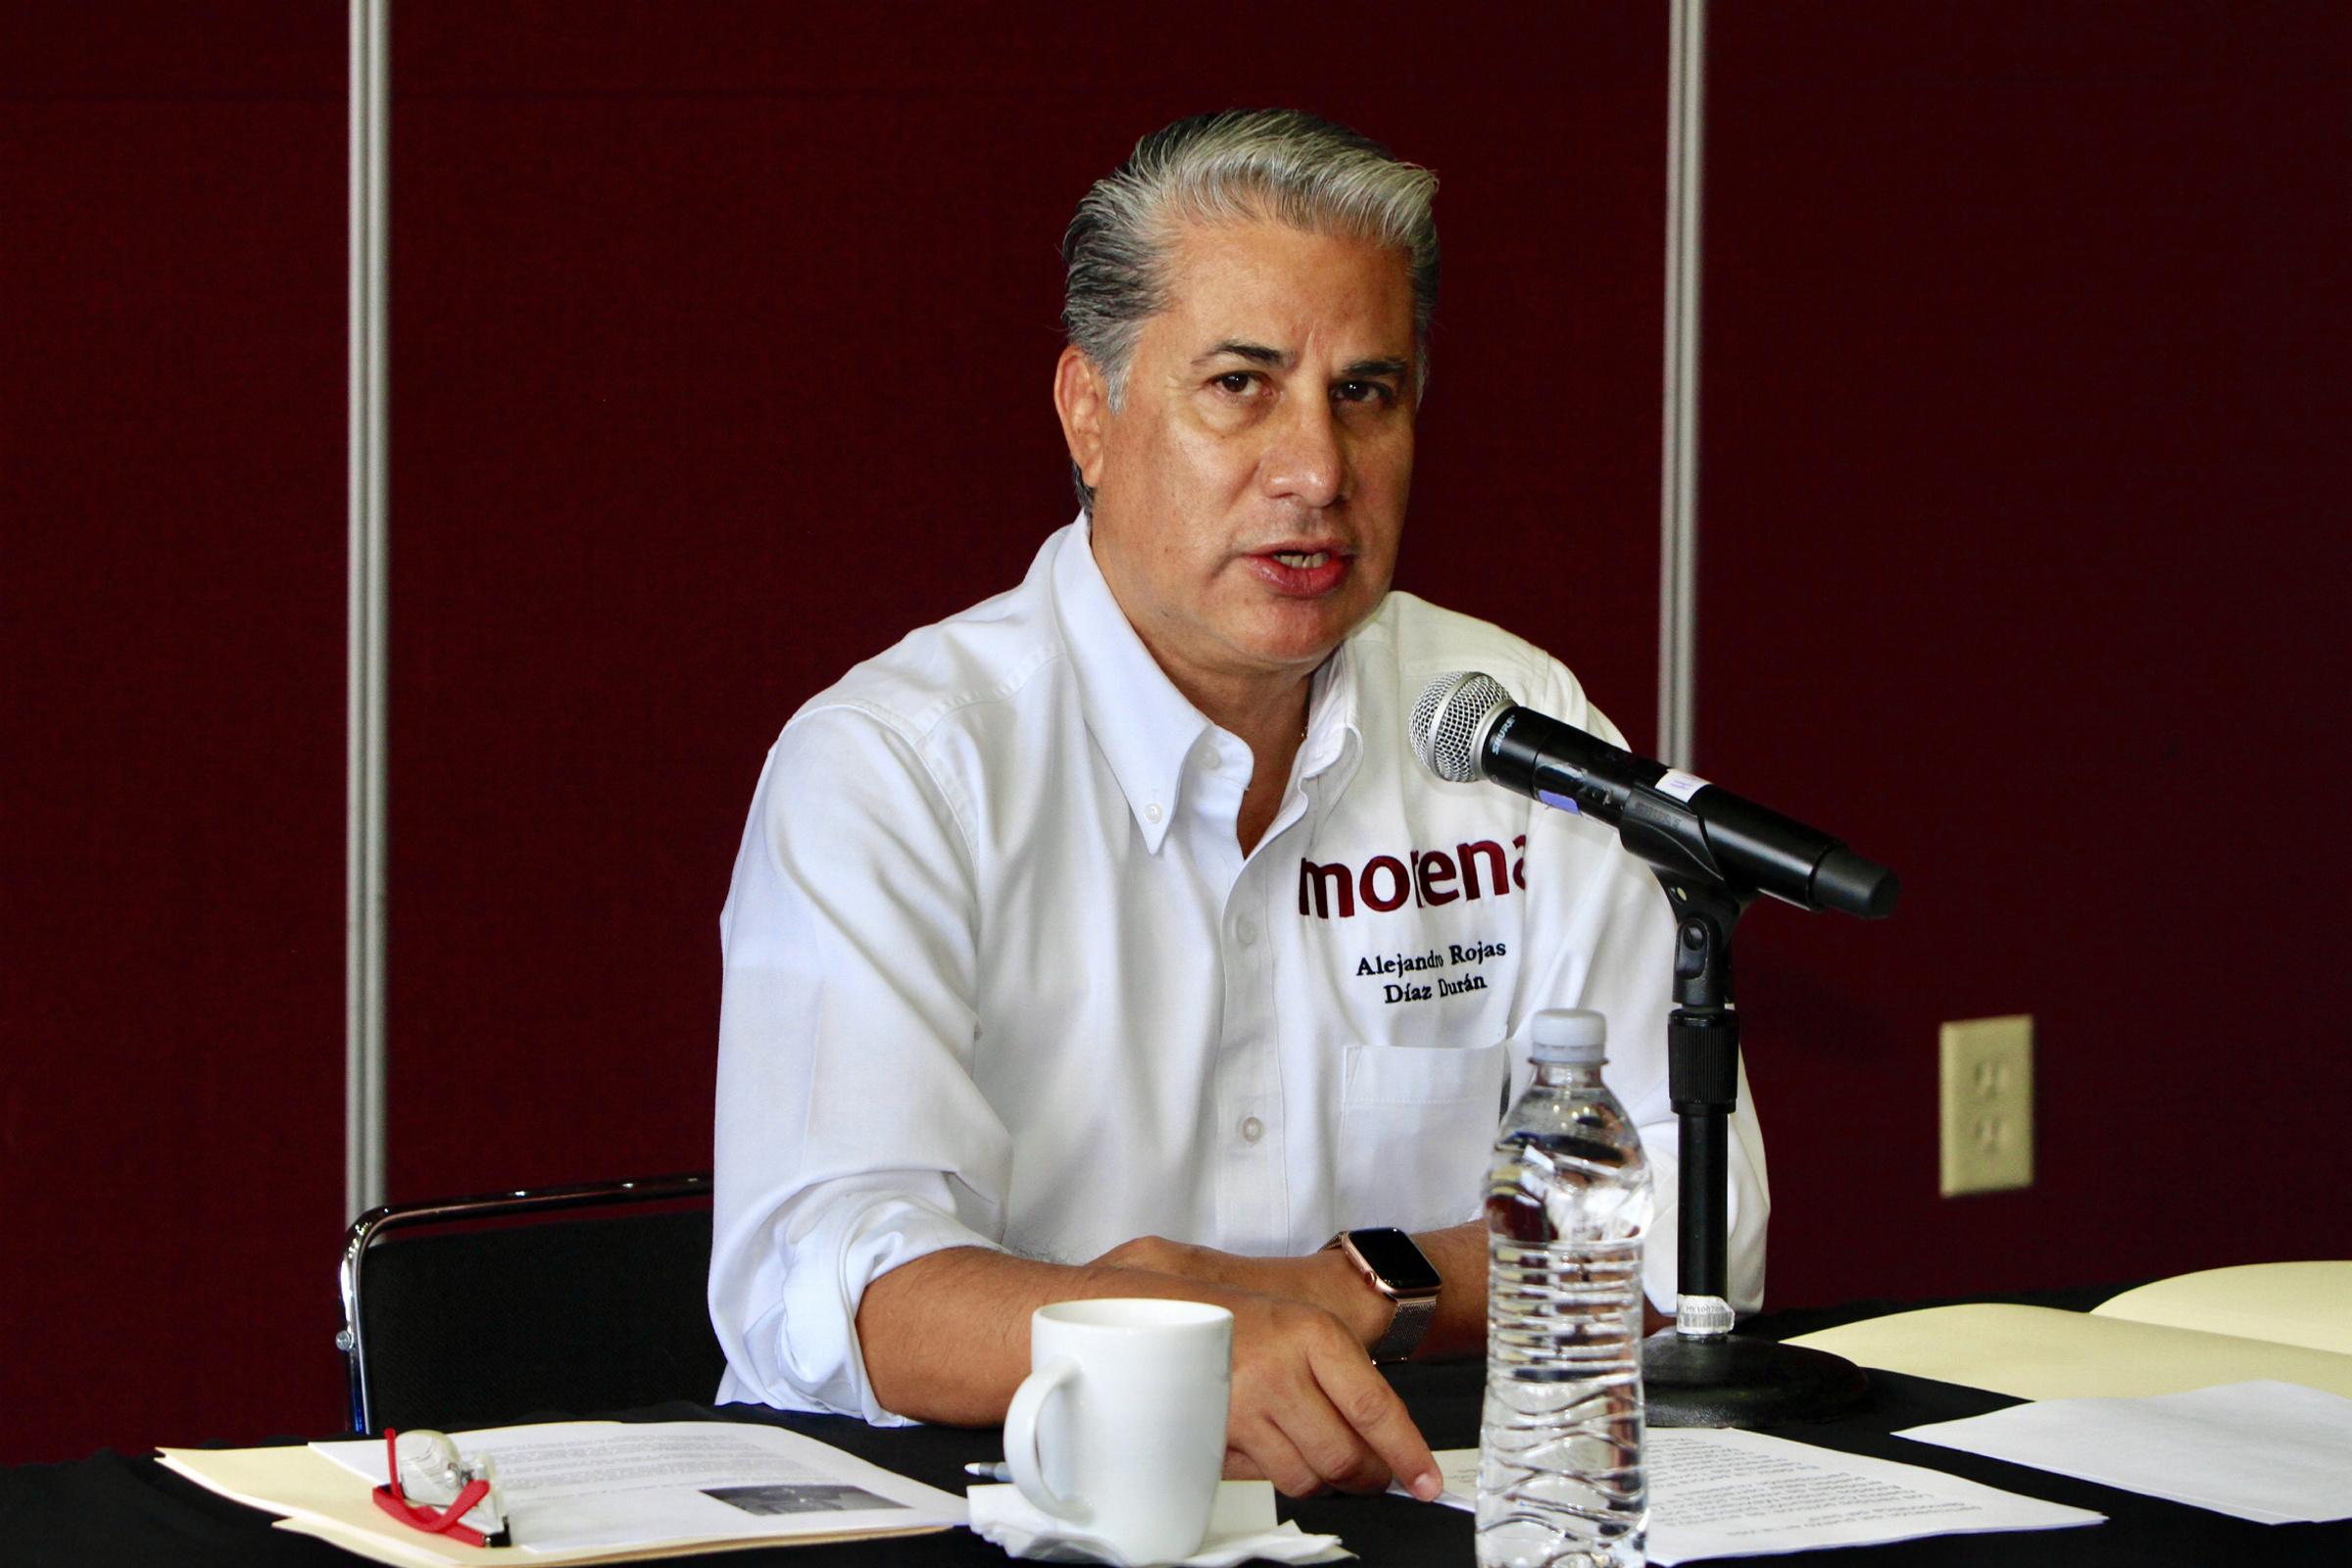 Alejandro Rojas Díaz toma el INE de manera pacífica